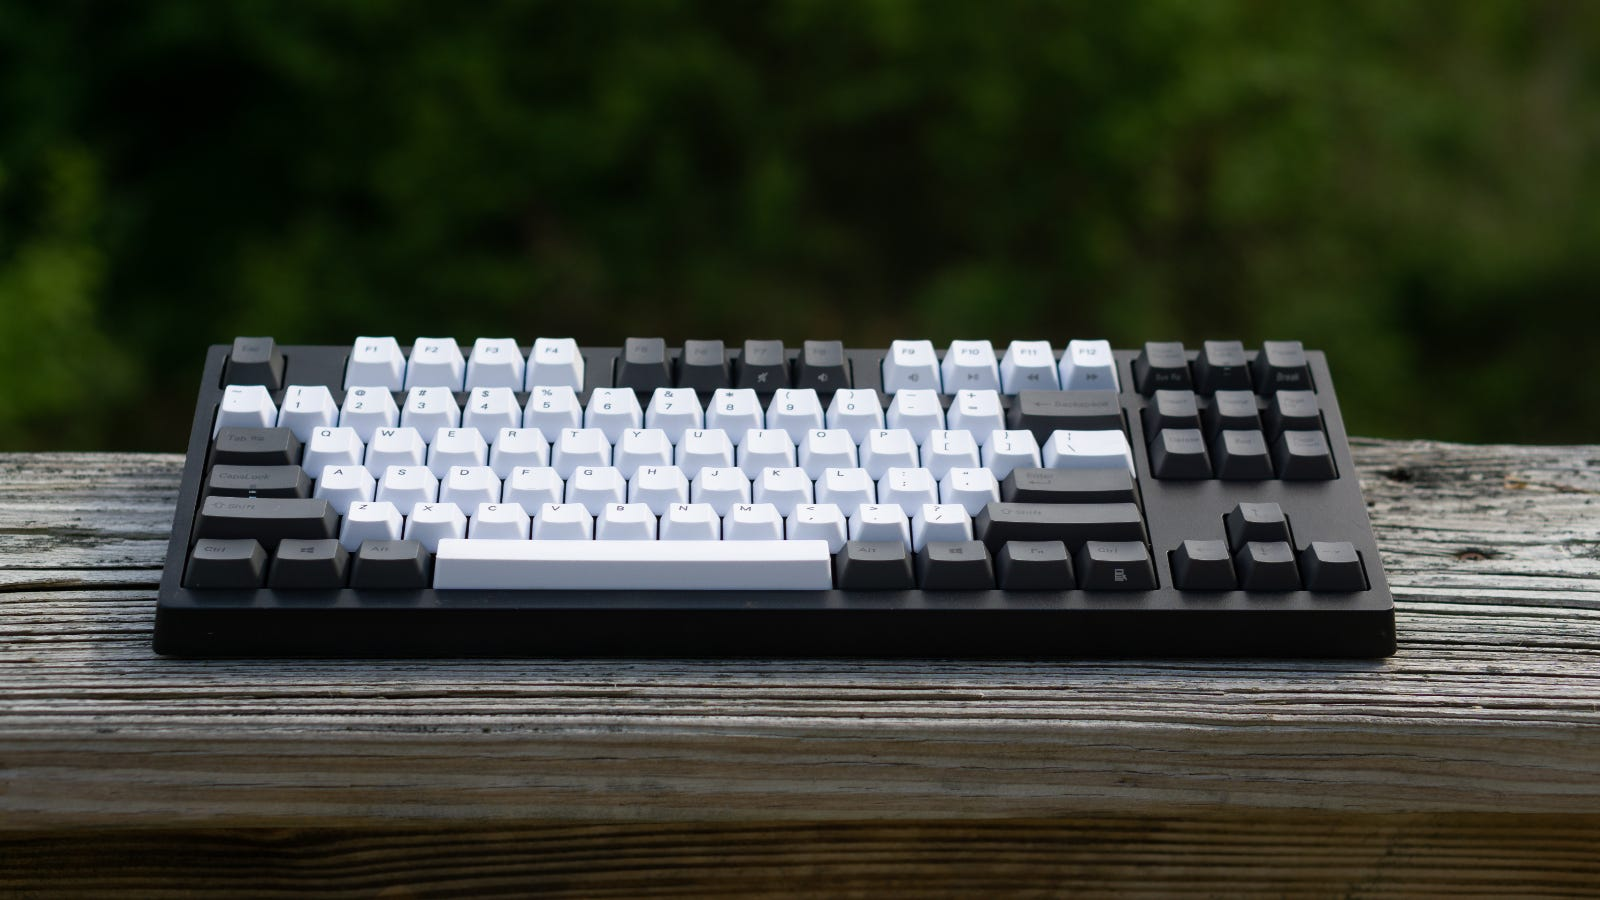 Gray, tenkeyless mechanical keyboard on a wooden railing